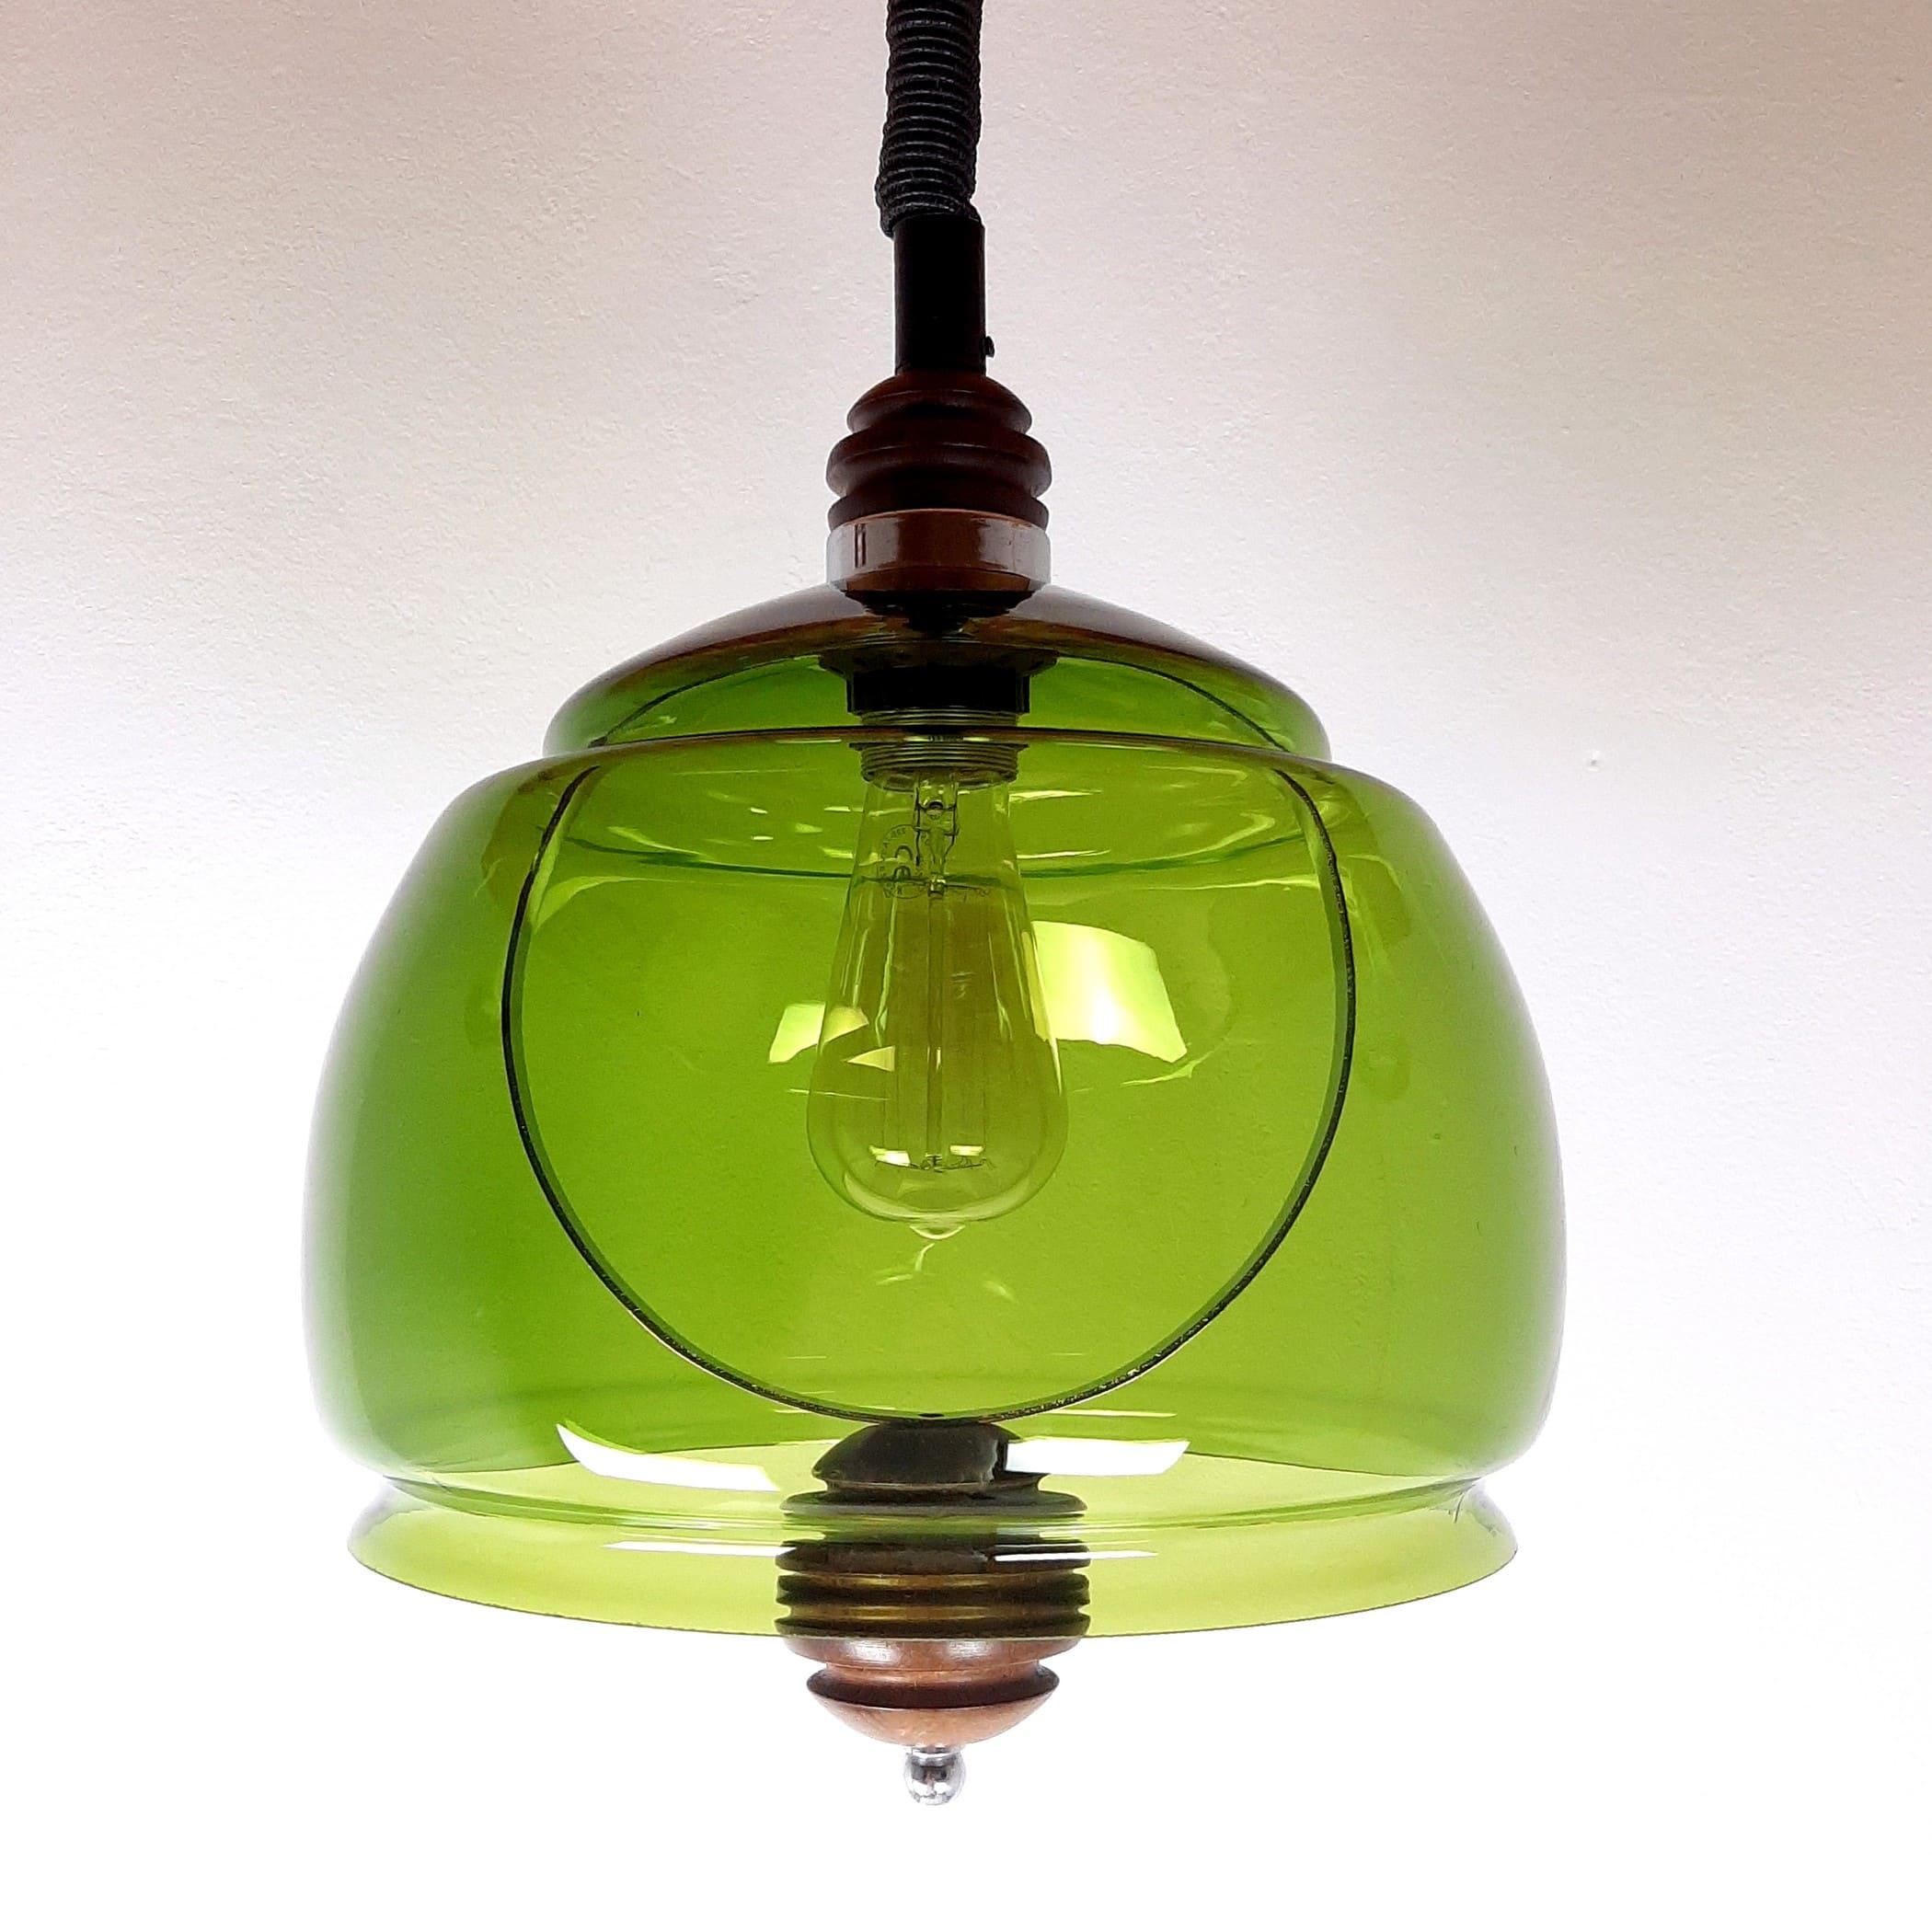 Rare mid-century pendant lamp Sijaj Hrastnik Yugoslavia '60s Vintage lighting Retro home decor Farmhouse Cottage Rustic